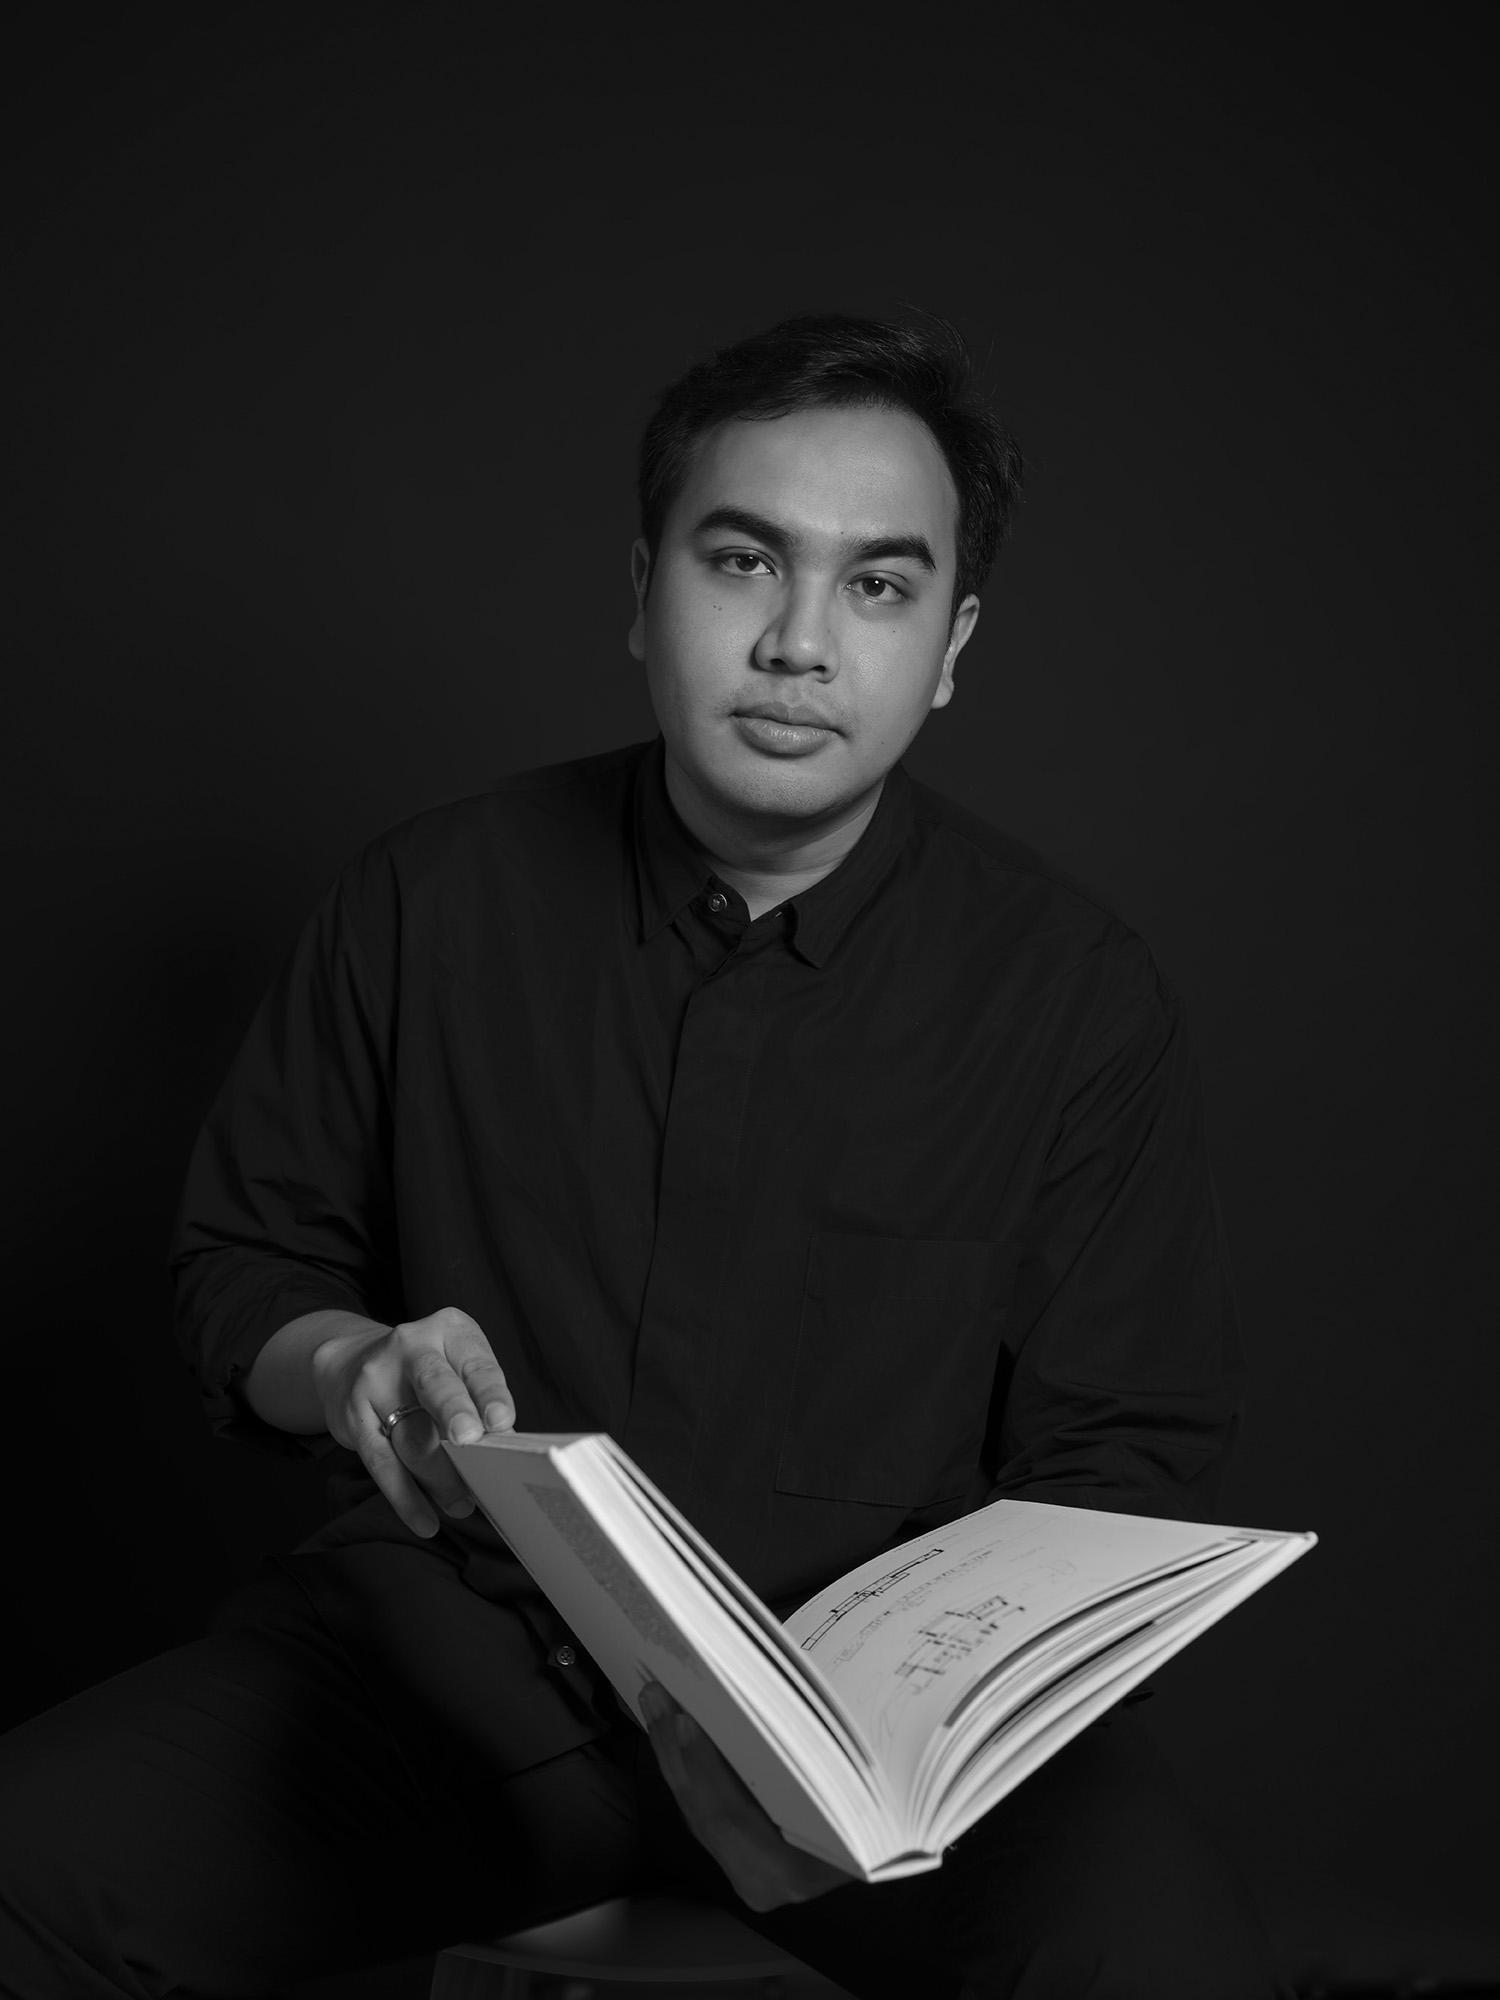 Ramboll Black and White Photography Portrait Photographer Singapore COCO Creative Studio 8